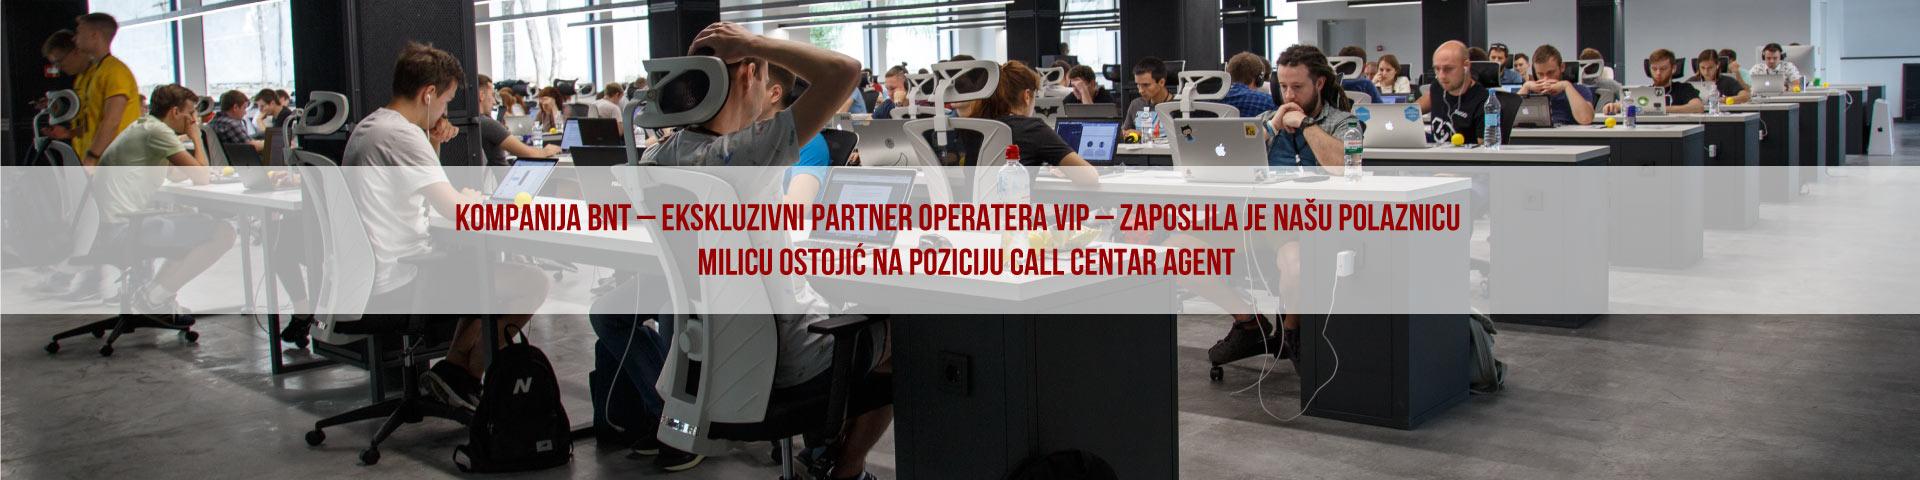 Slider_Uspesi_Polaznika_vip